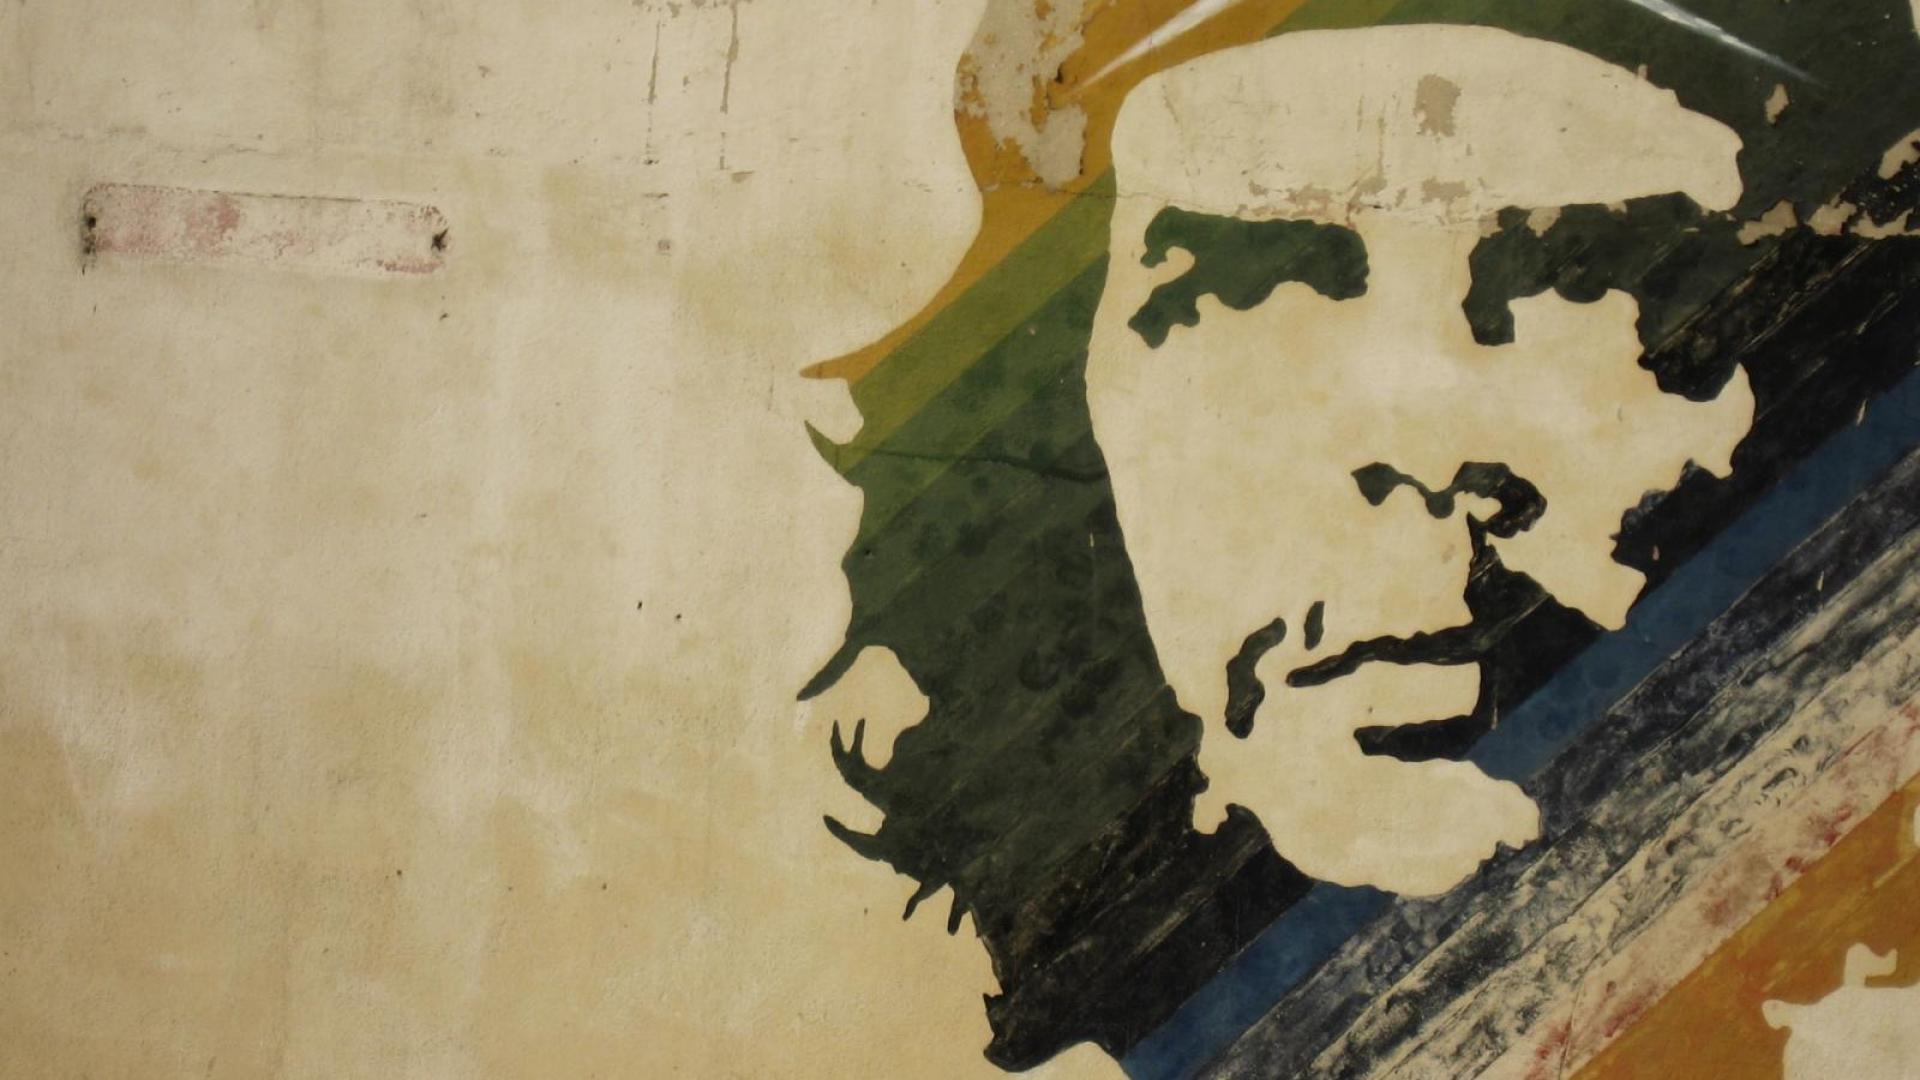 Che Guevara Wallpapers WeNeedFun 1920x1080